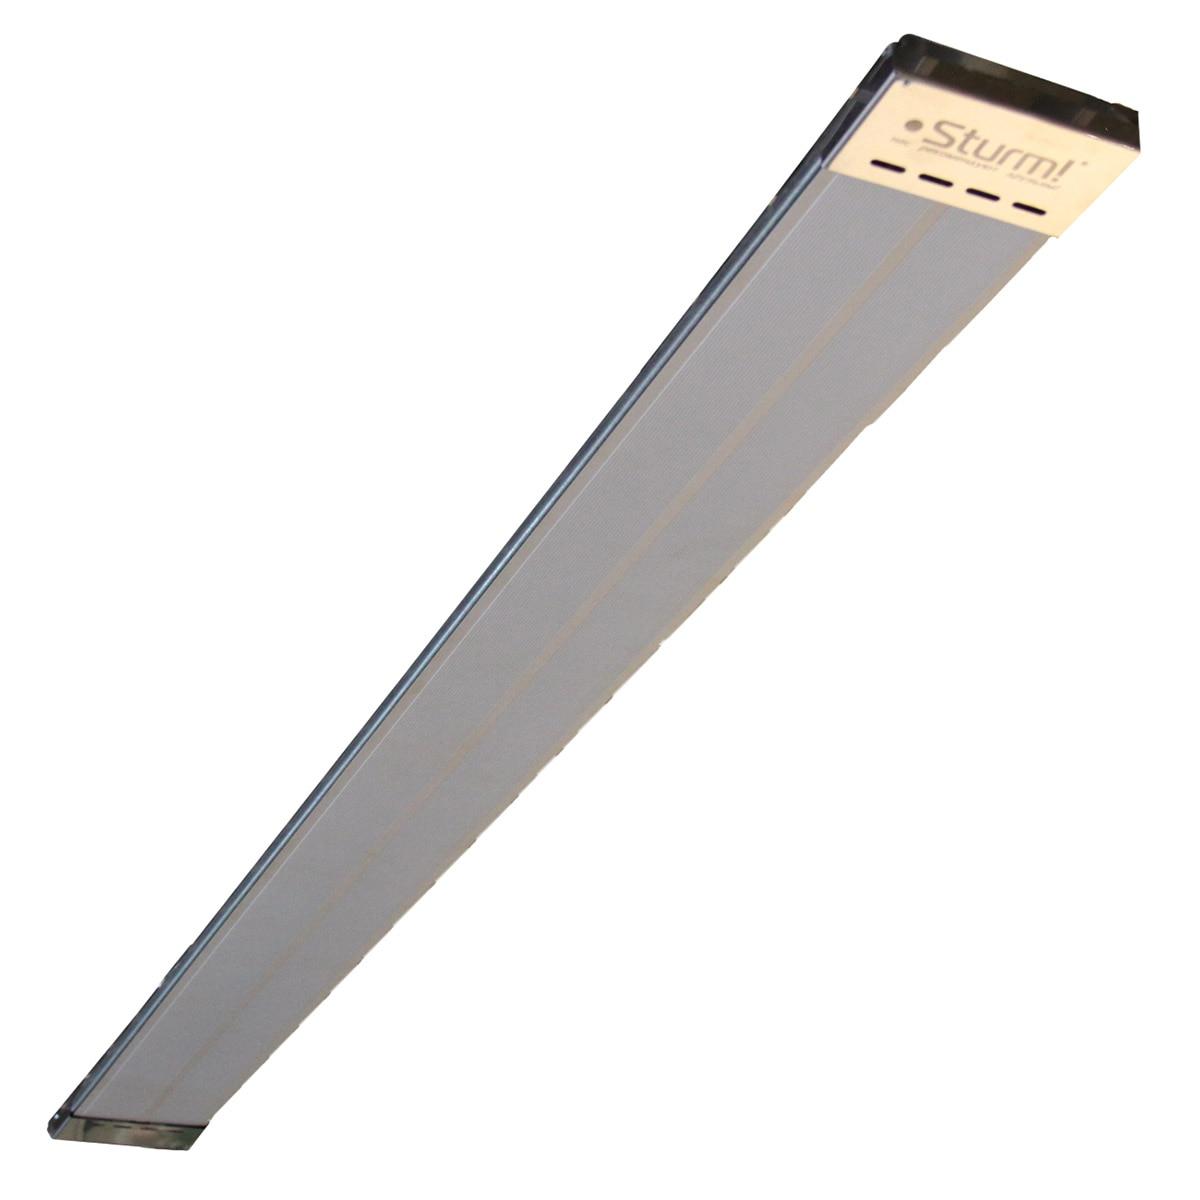 Infrared heater Sturm! IH1000 (Rated power 1000 W, Voltage 220 v, Max current 4.5 A, цена в Москве и Питере